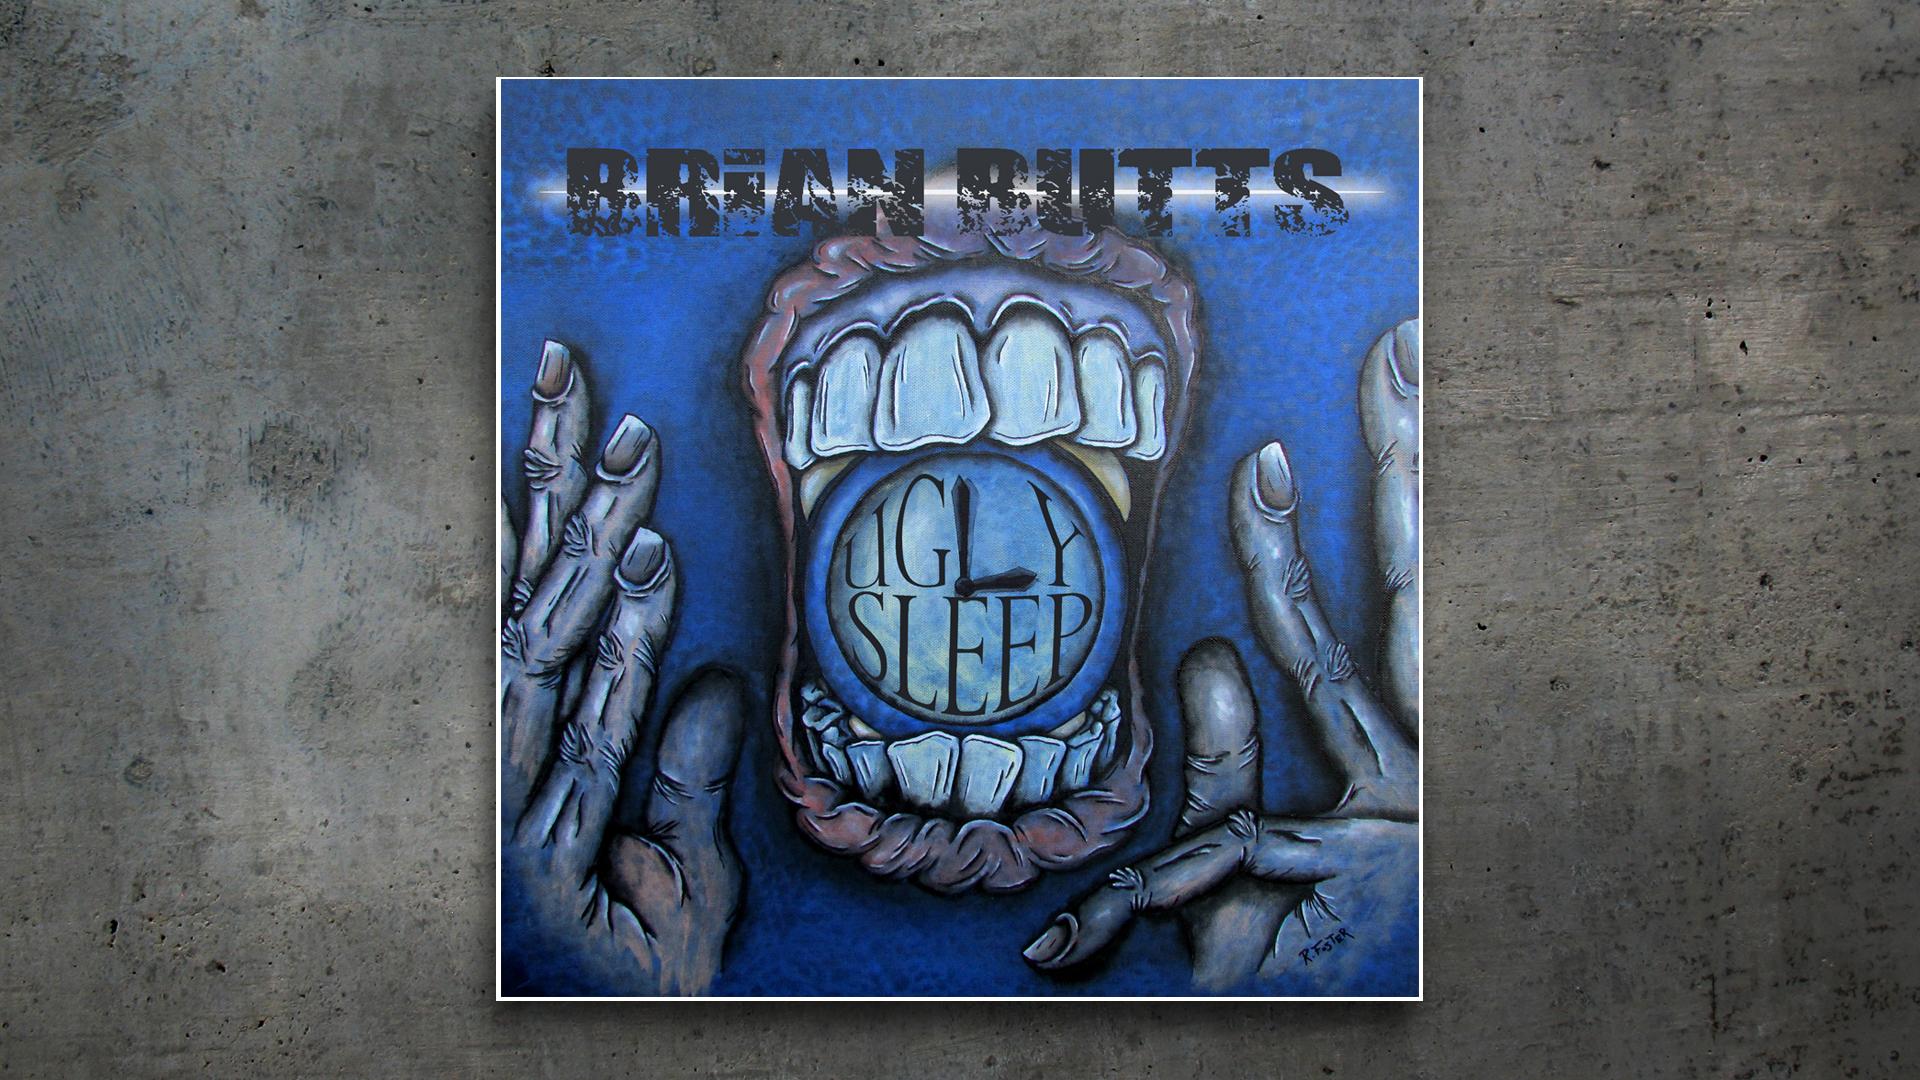 Album Cover Design: Ugly Sleep